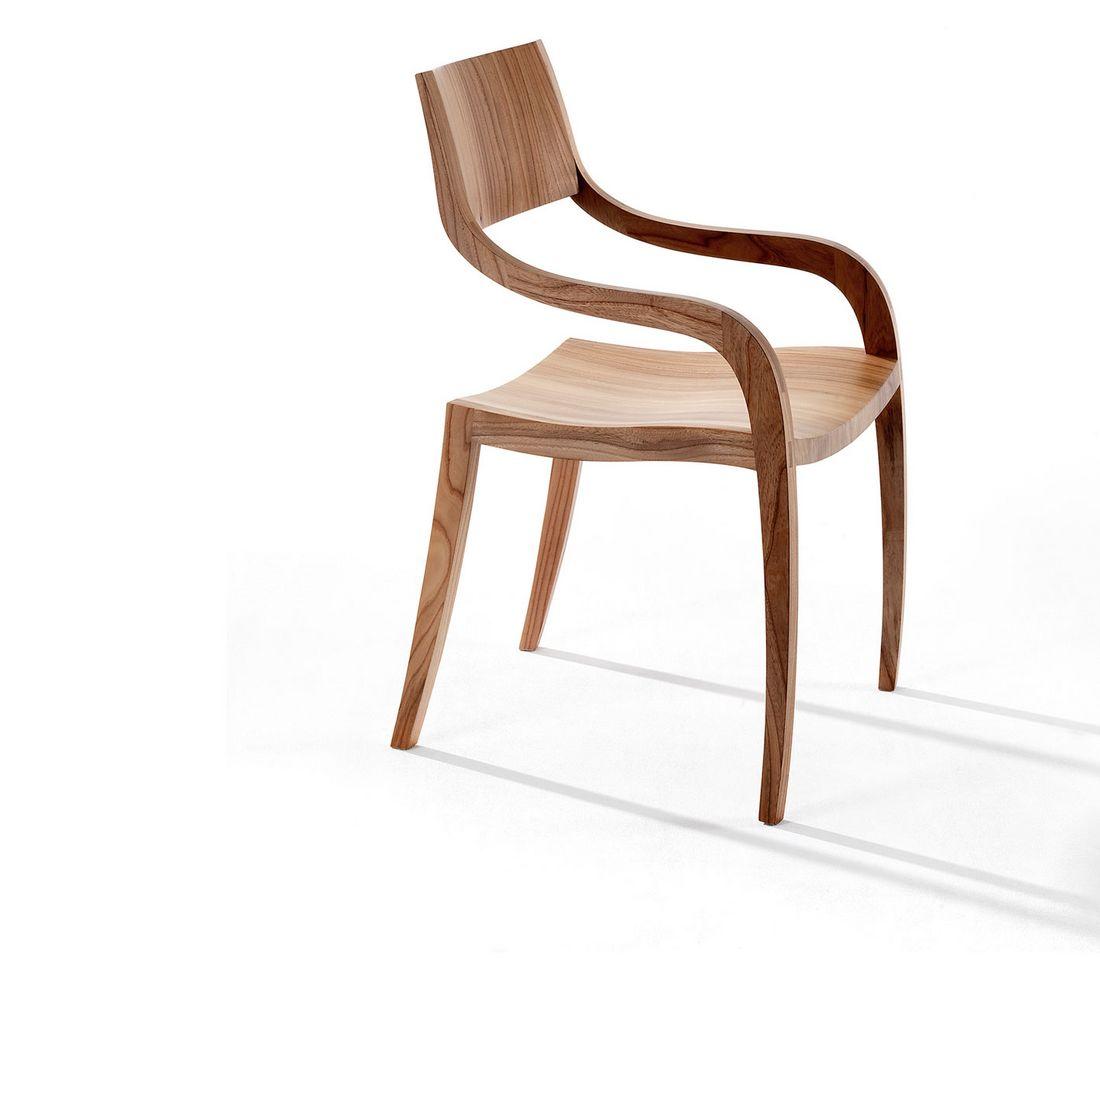 Designer st hle aus holz und leder produziert in appenzell for Design stuhl wave